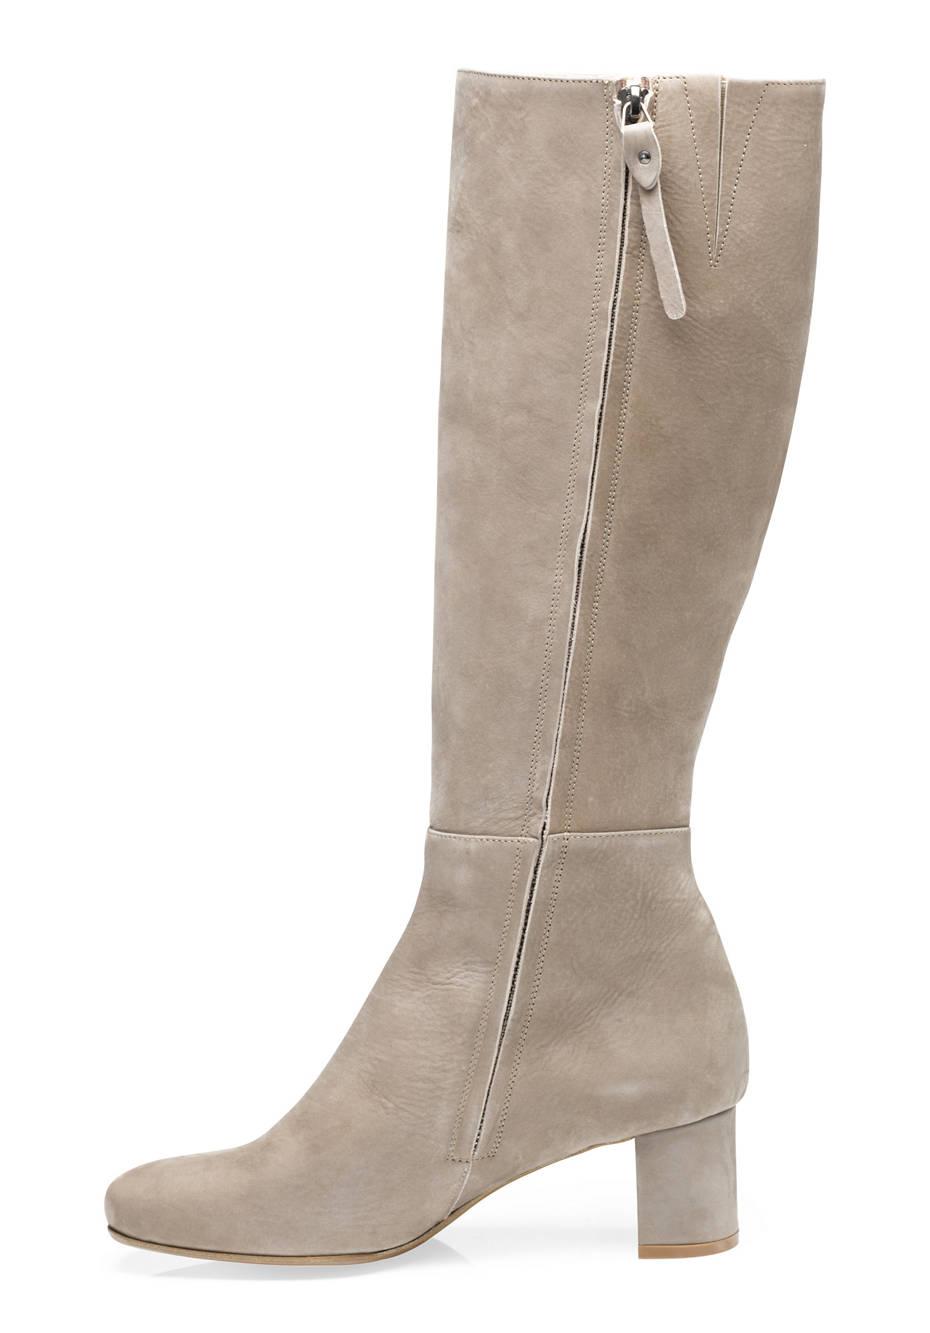 Damen Stiefel aus Leder